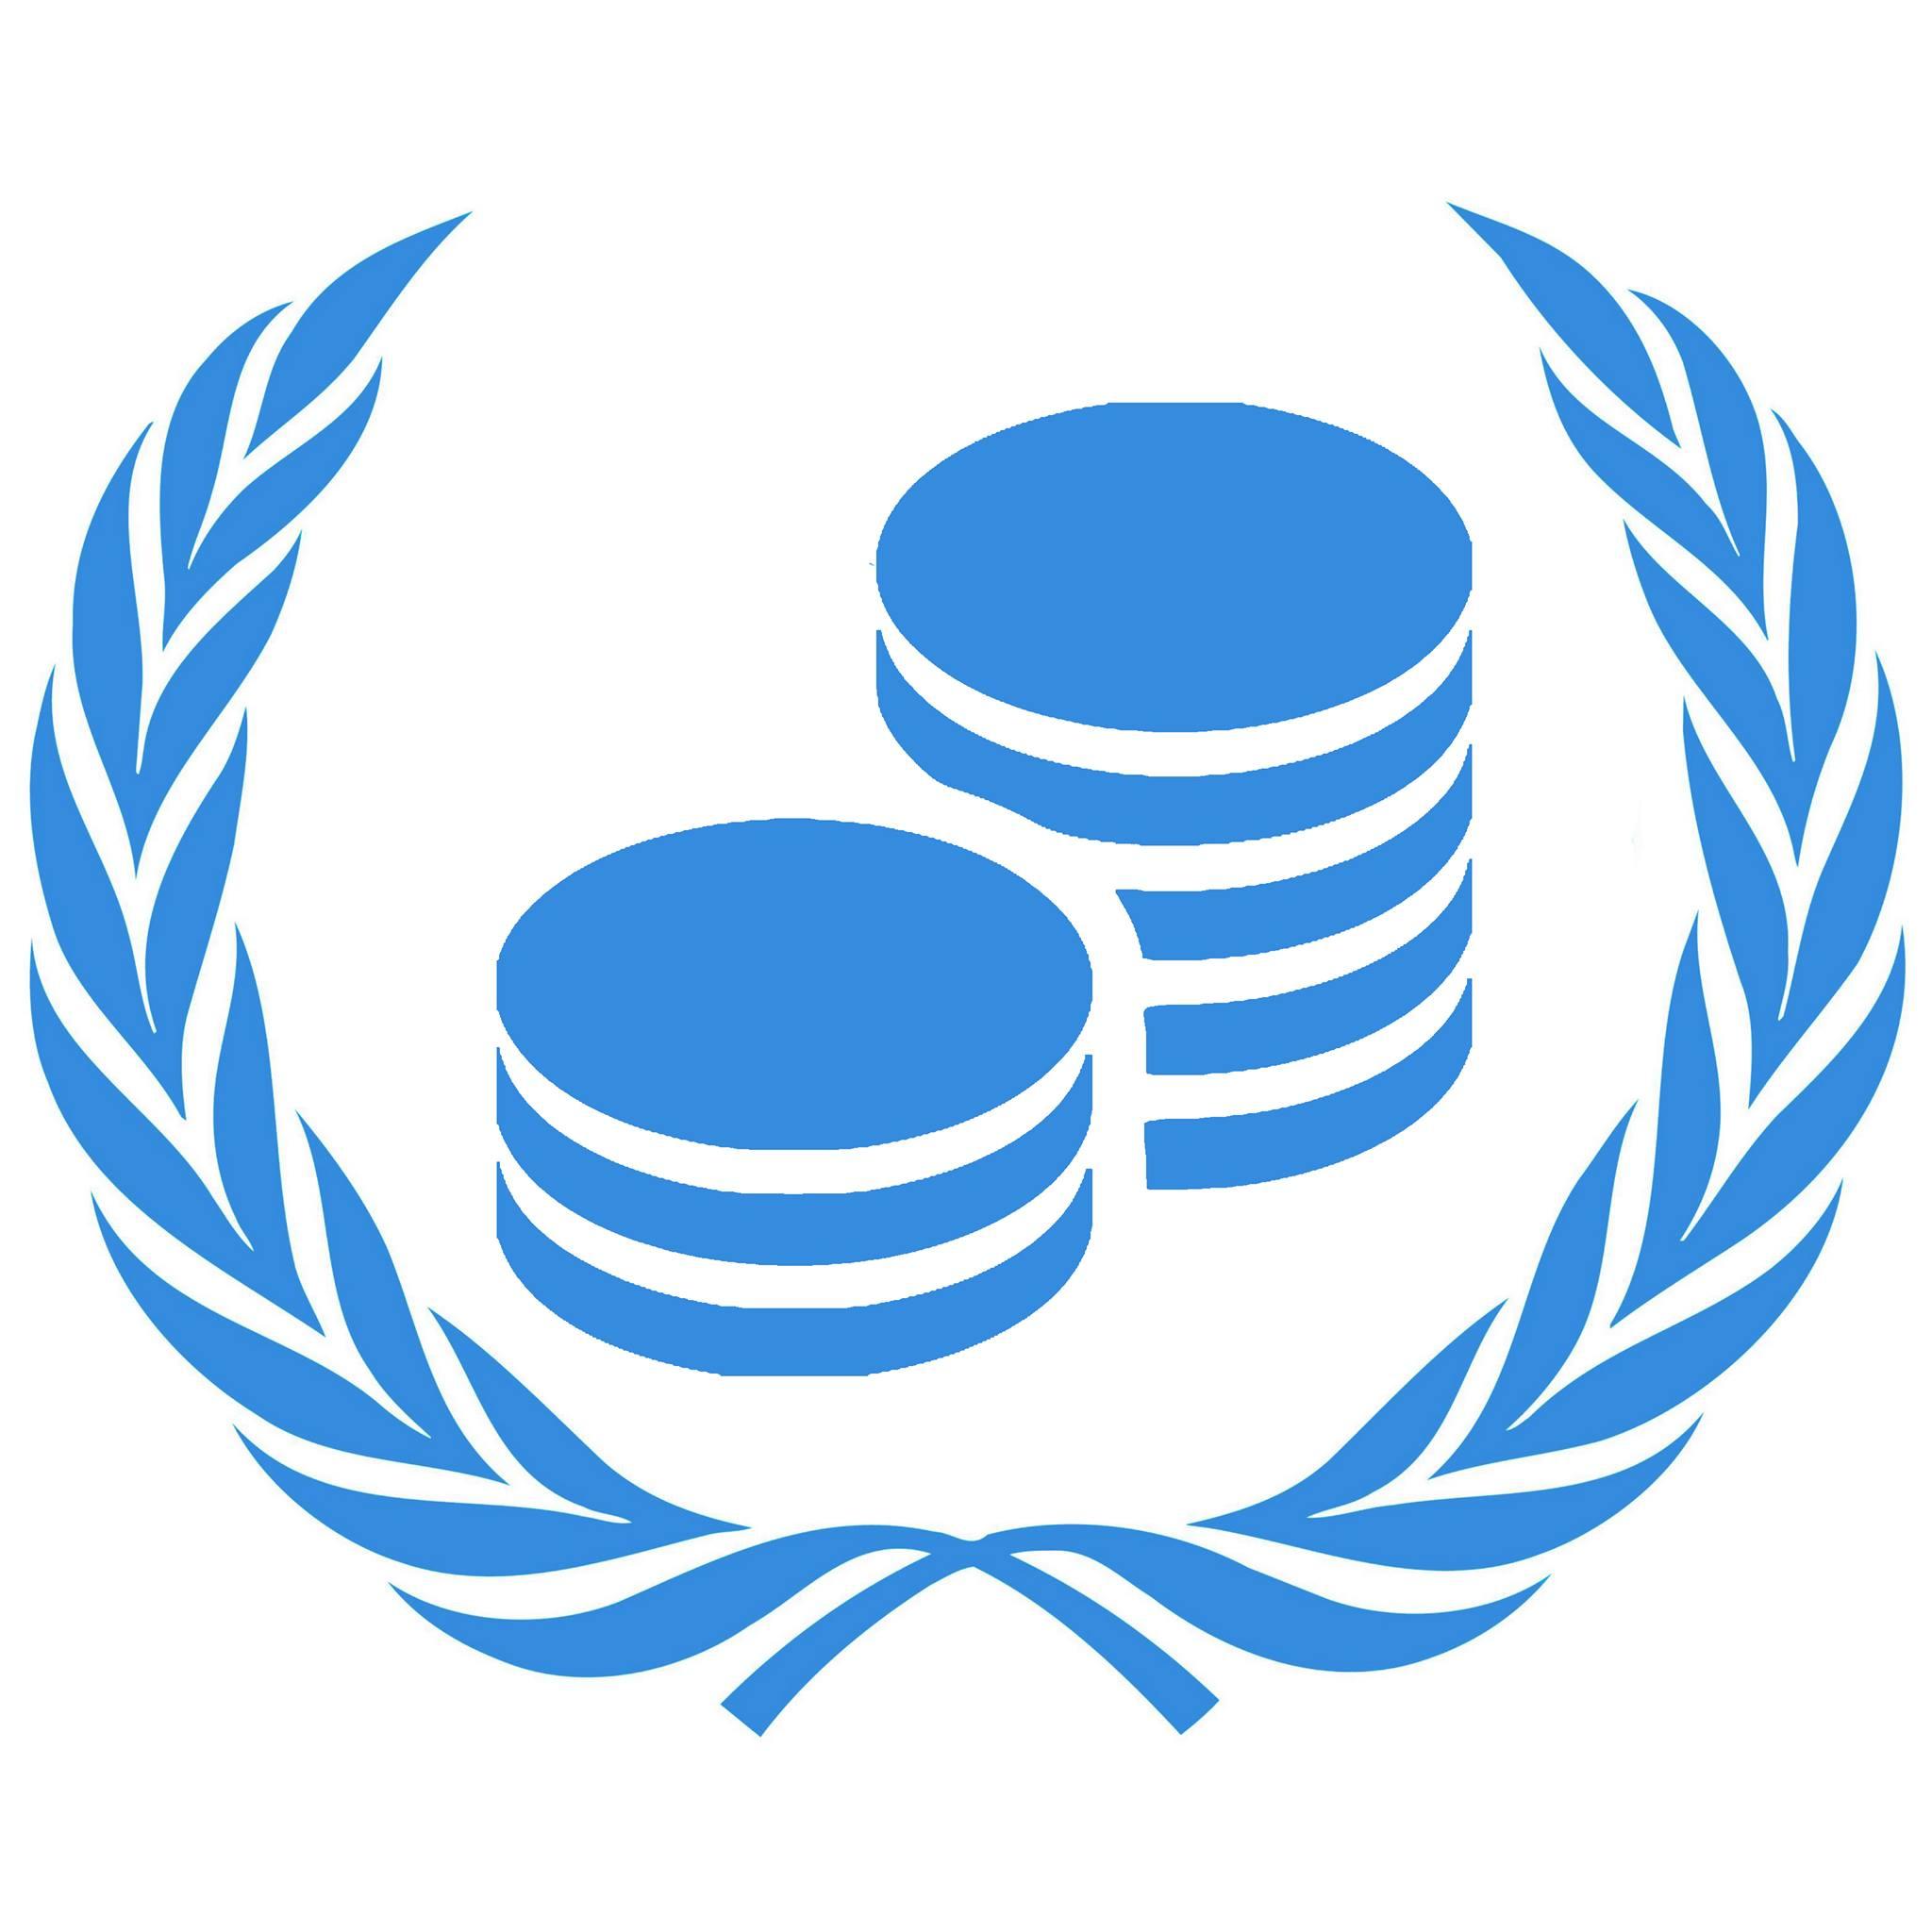 Pmunc economic and financial committee biocorpaavc